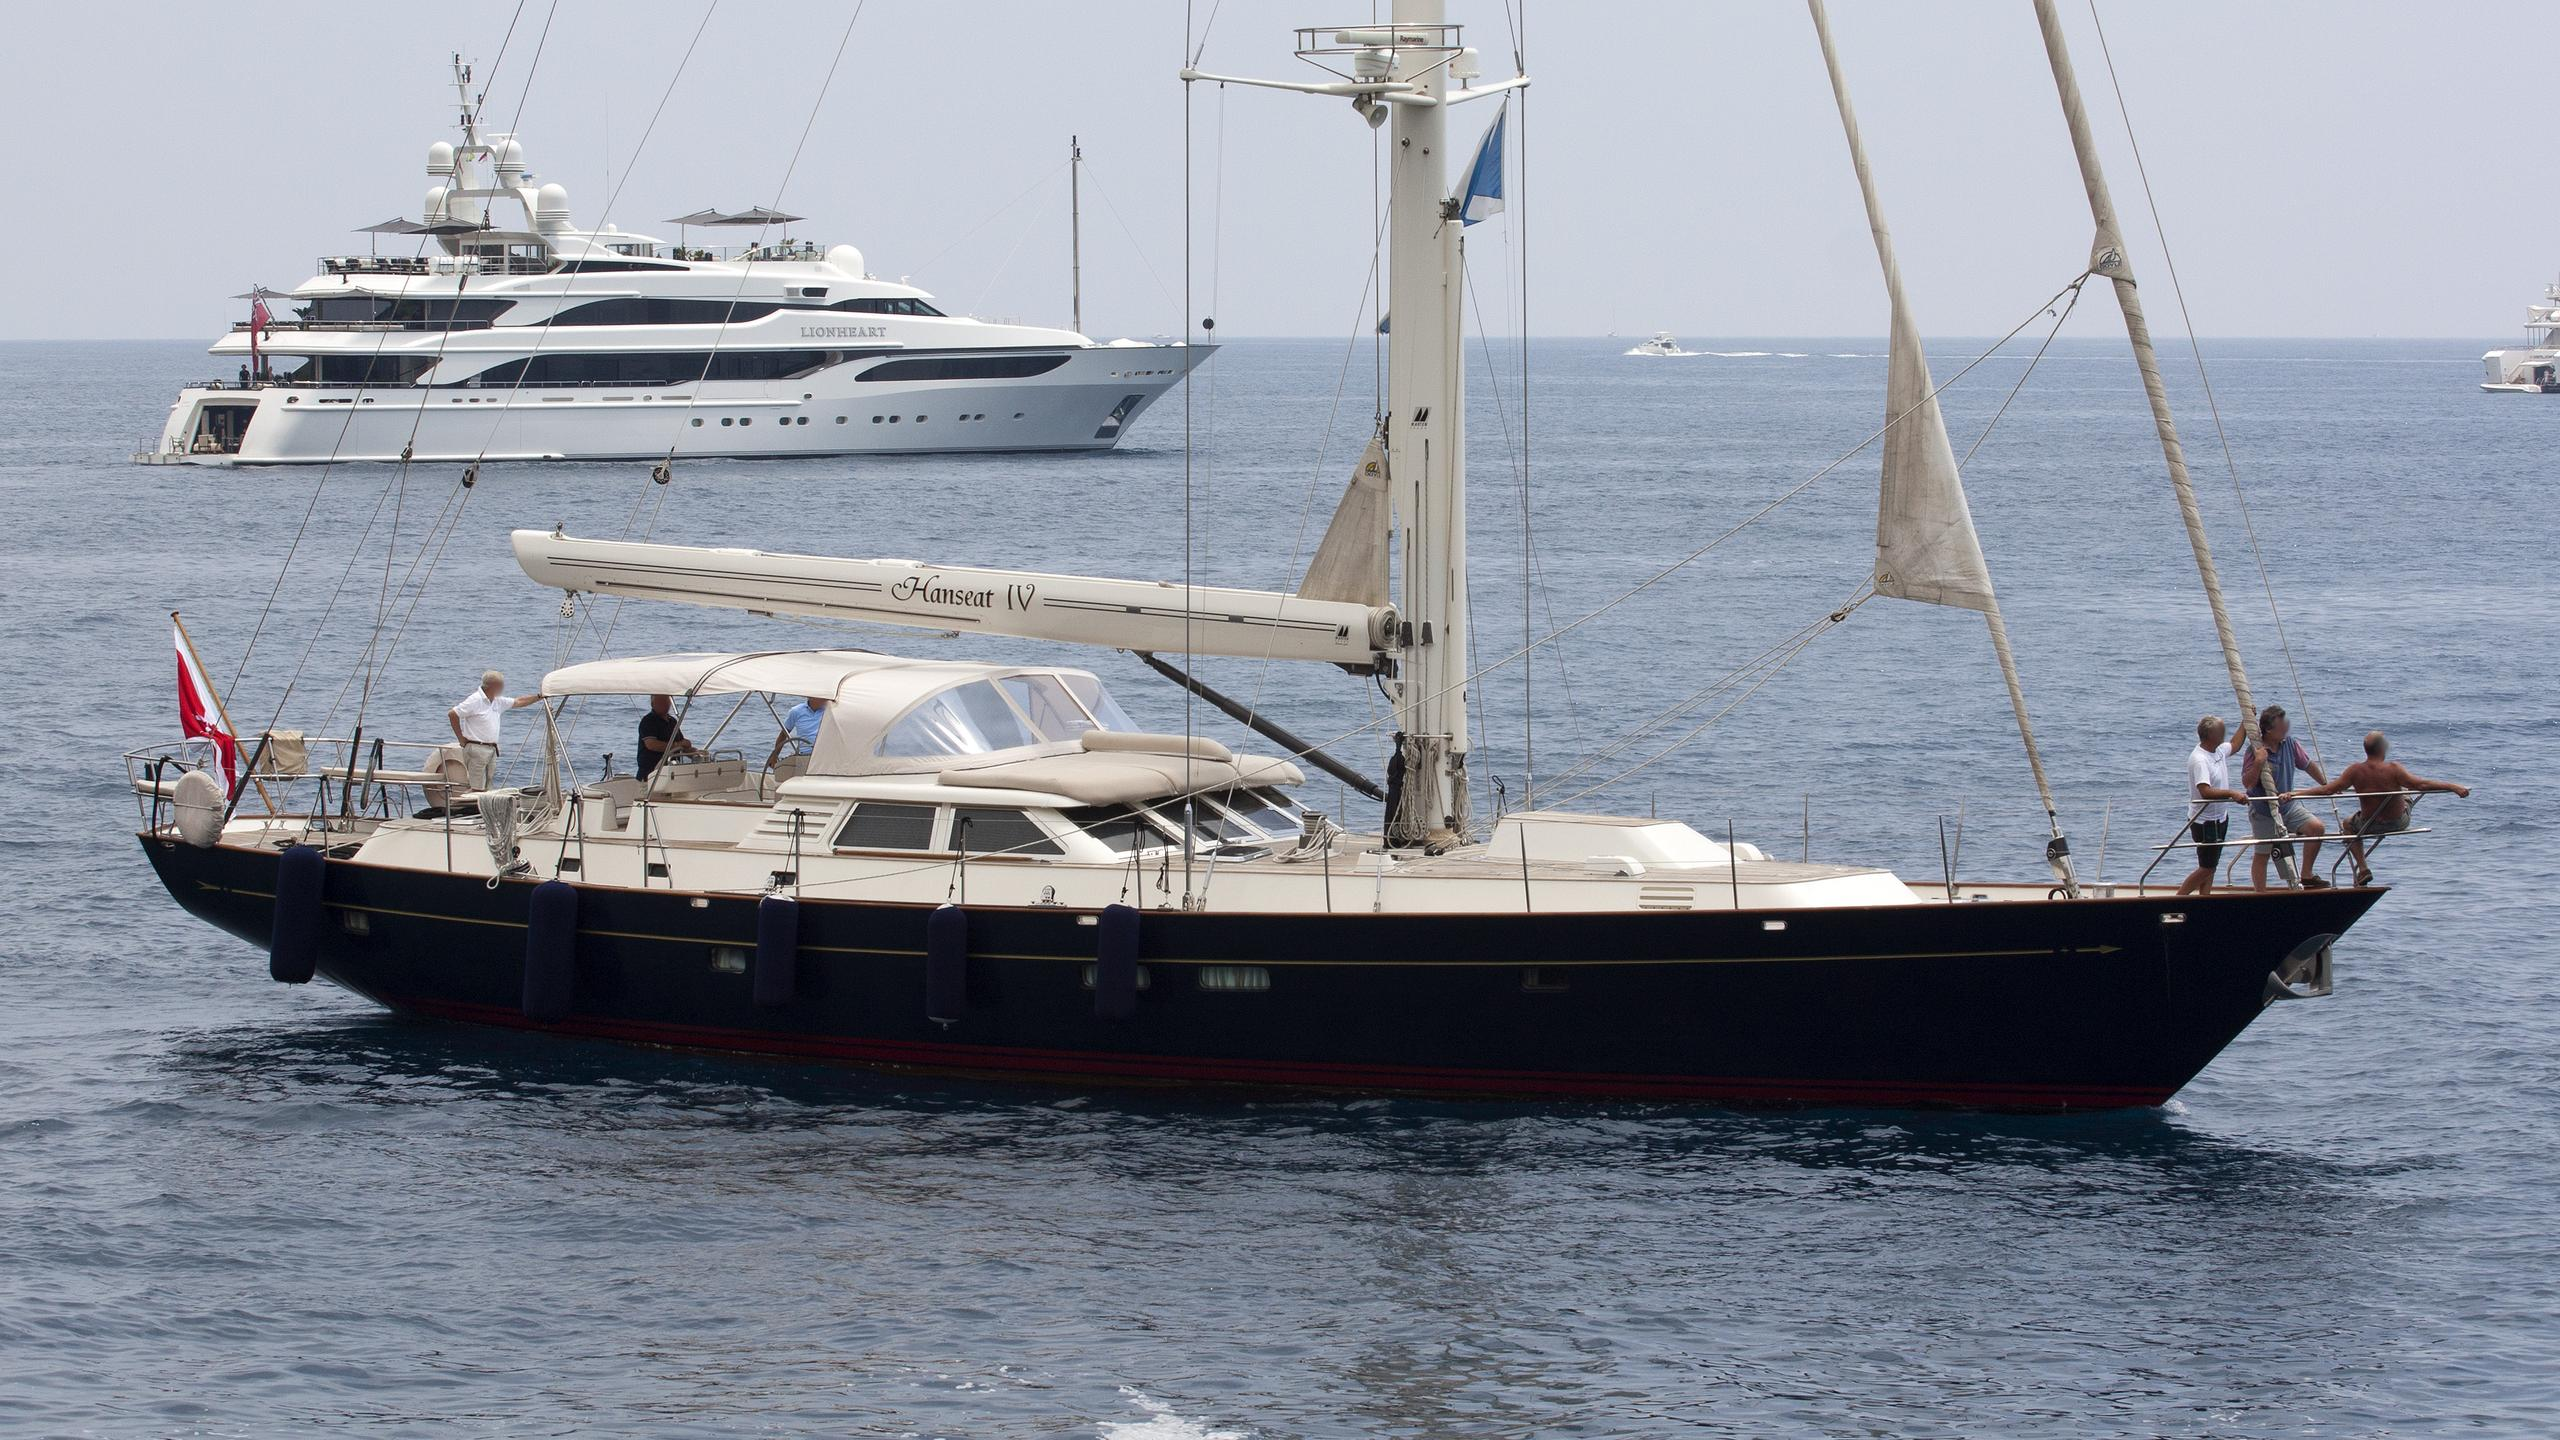 hanseat-iv-yacht-exterior